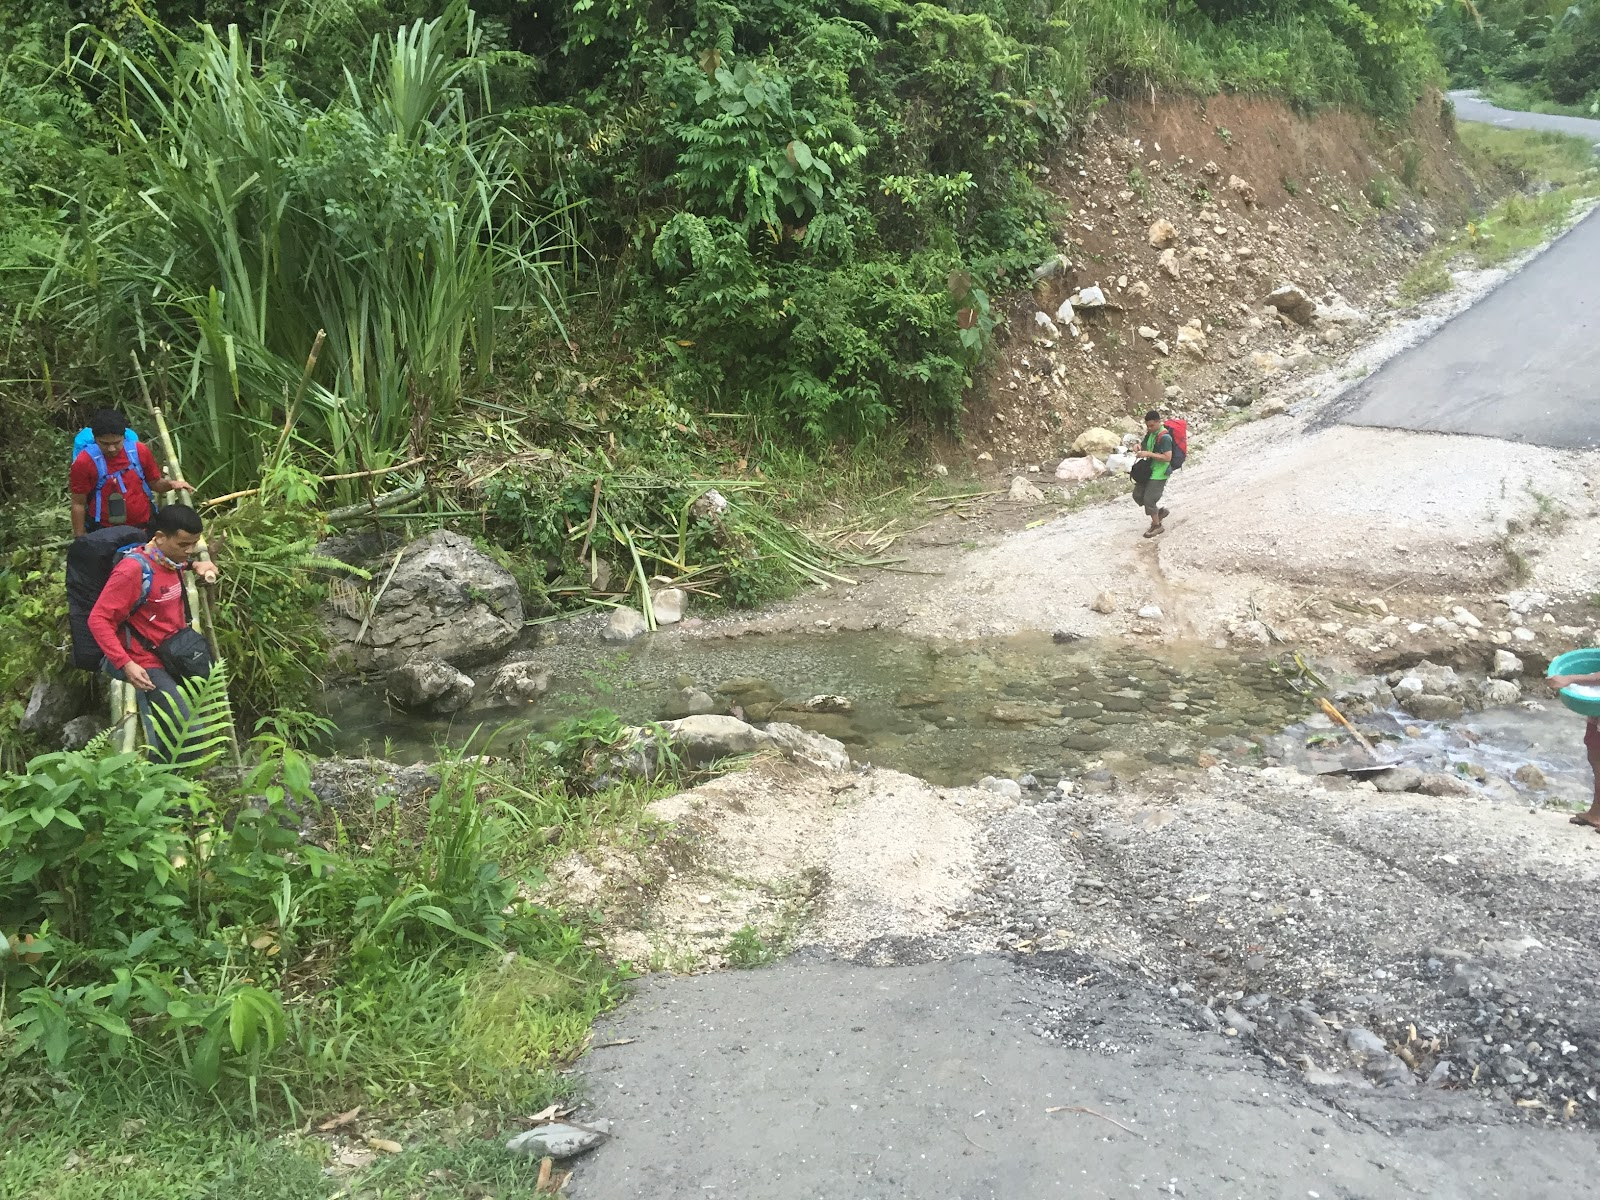 Pendakian Gunung Binaya (Binaiya),    Pulau Seram, Maluku - Bagian 1